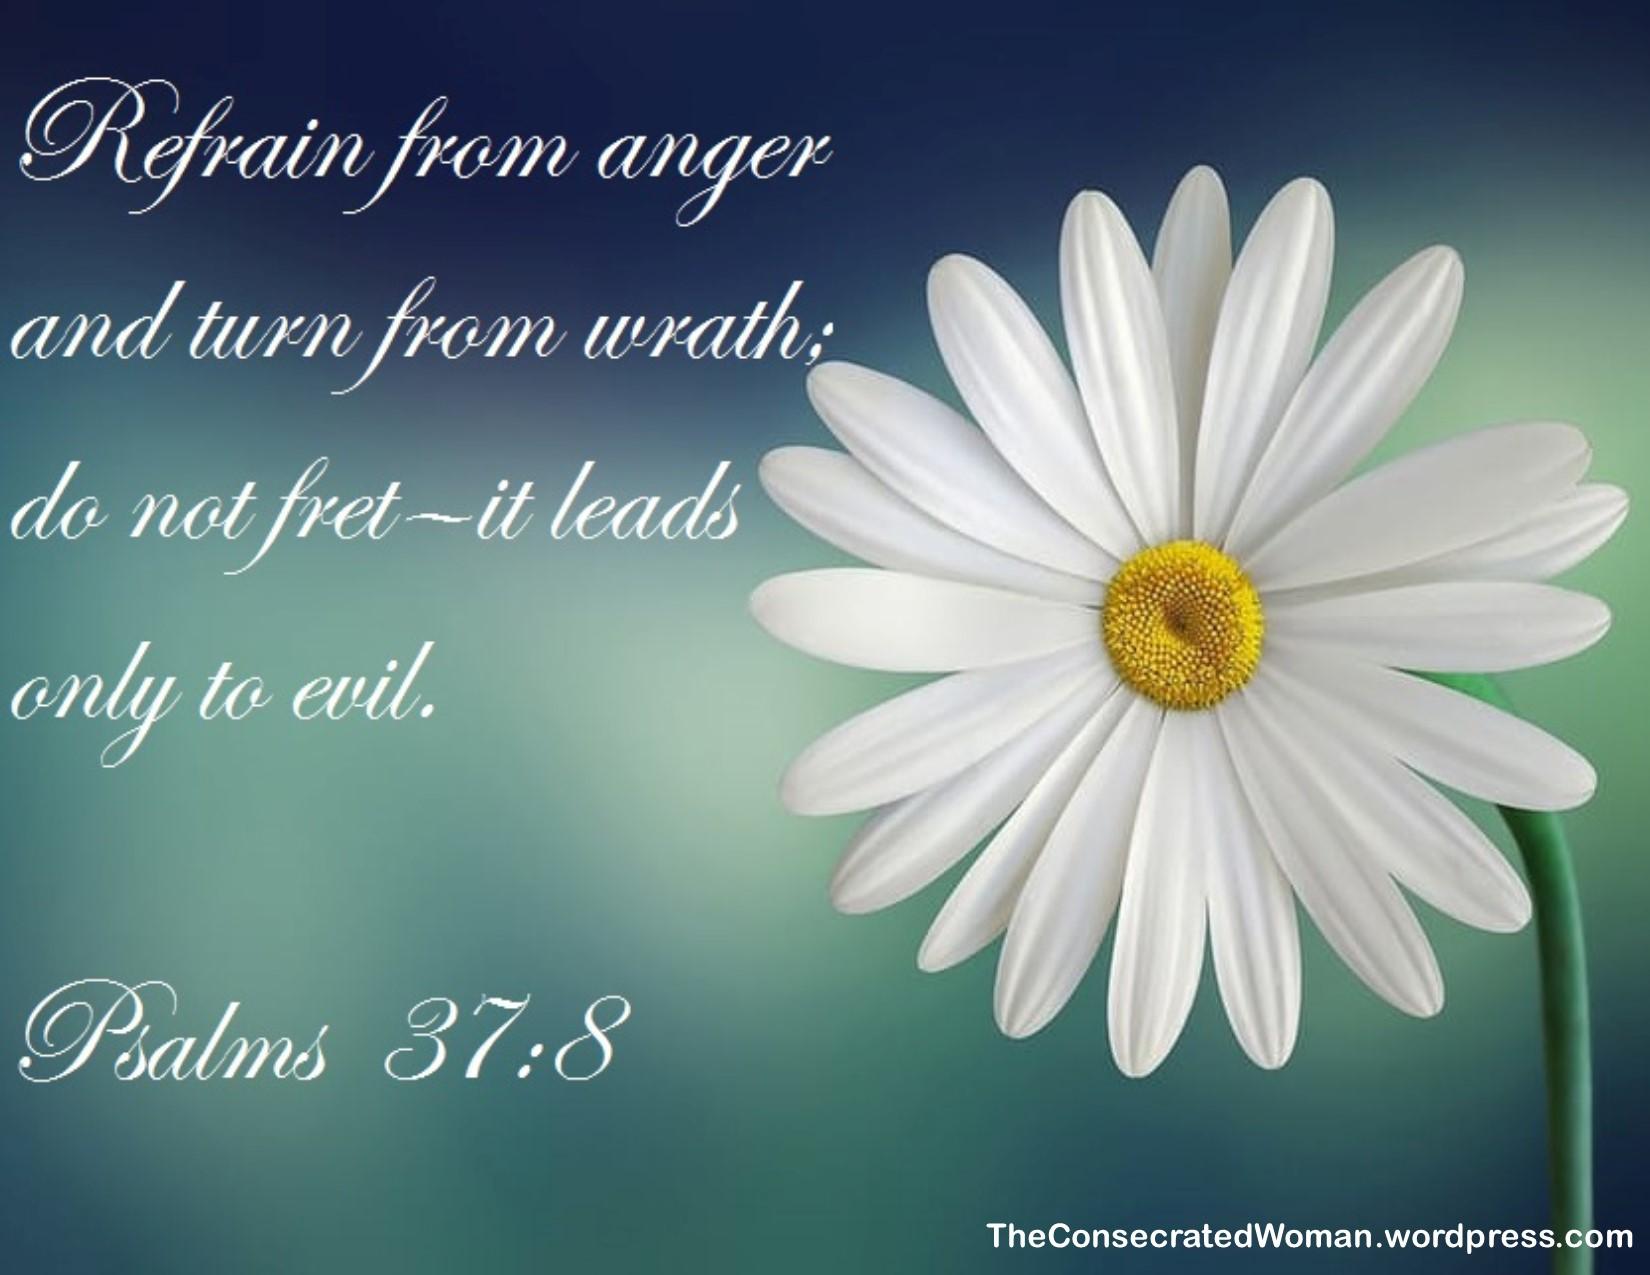 1 1-18 18 Psalm 37 8